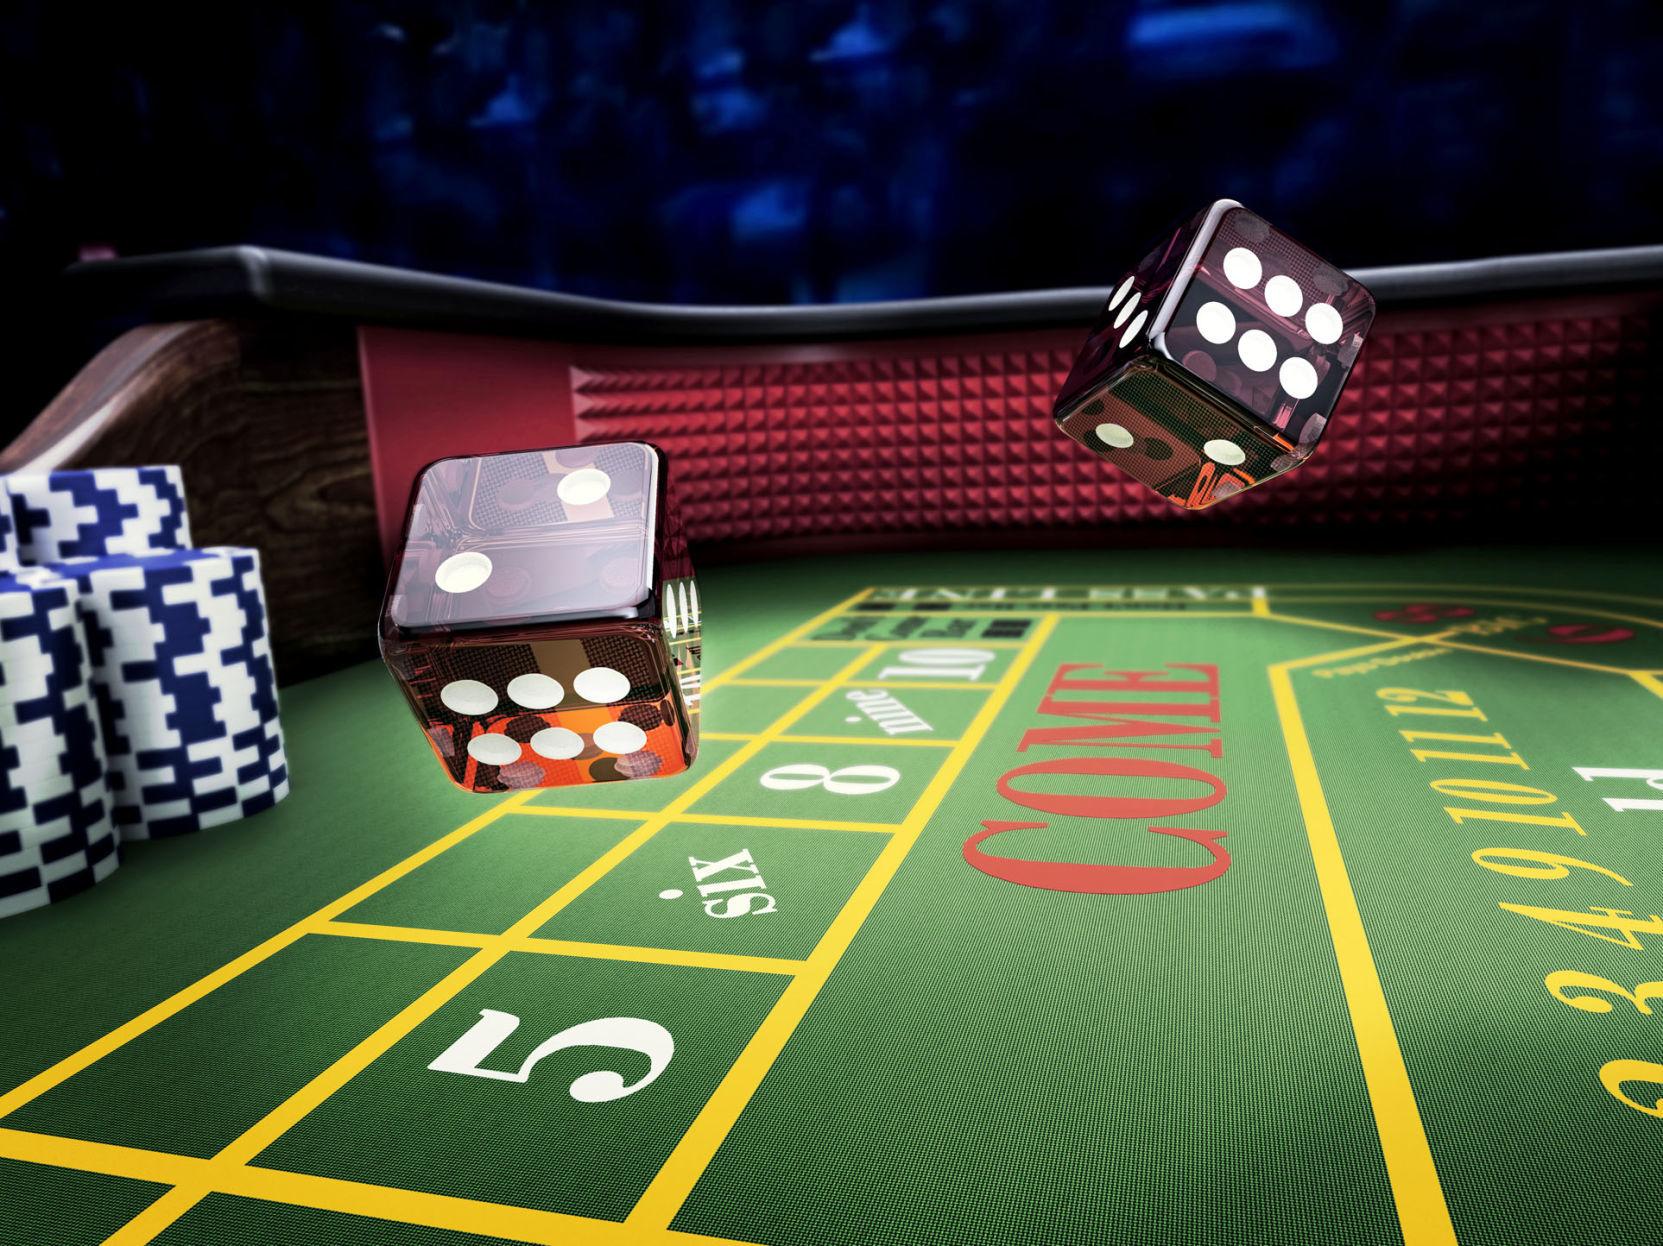 Gambling in taos new mexico